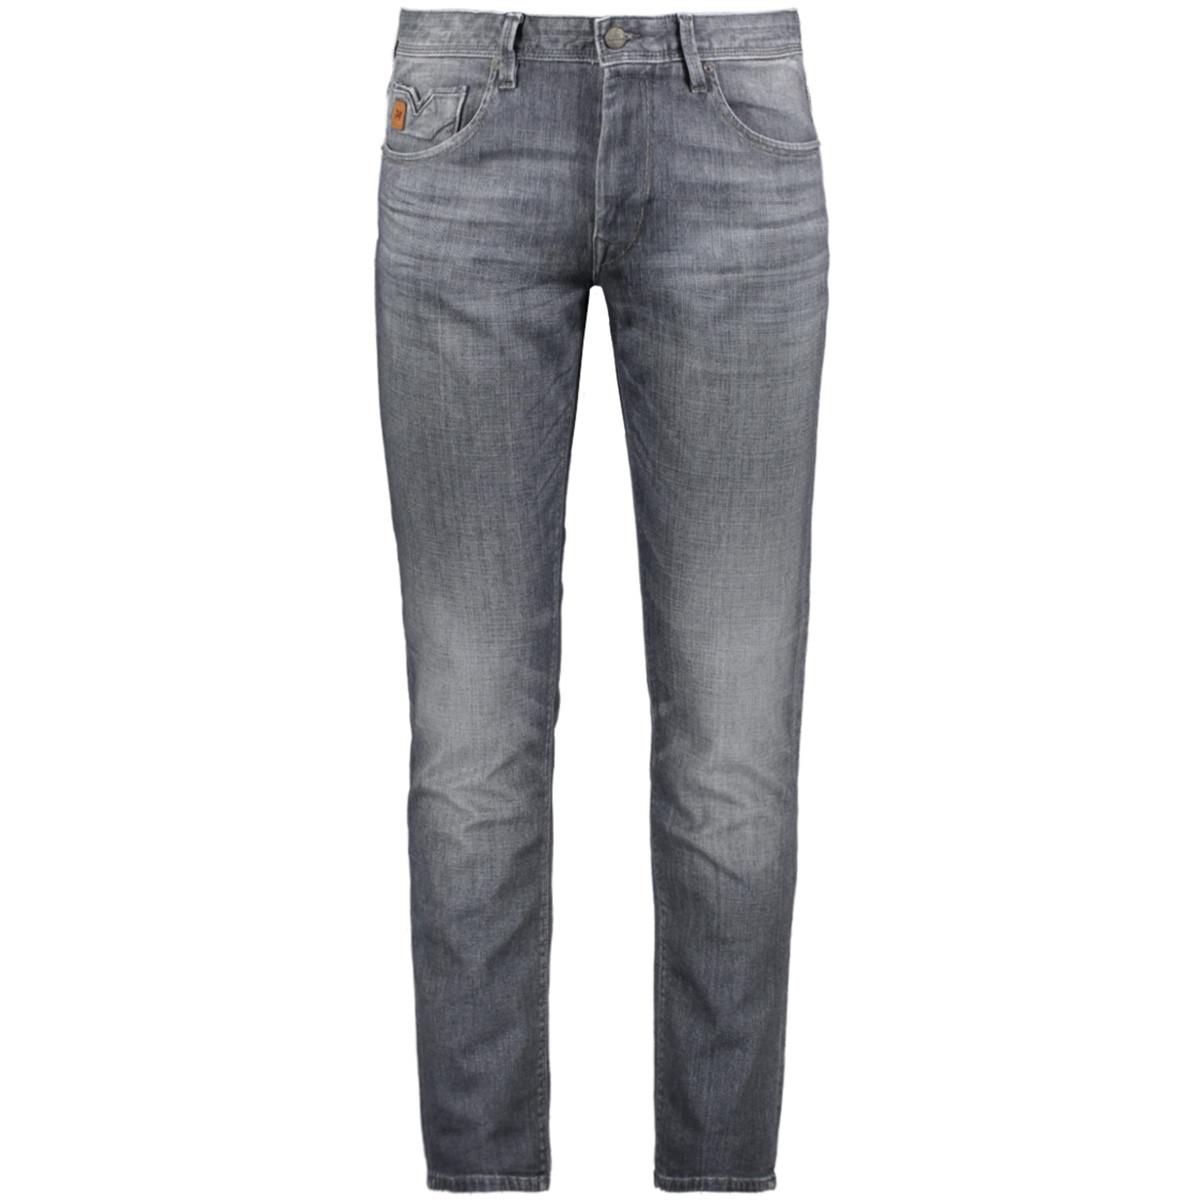 Grijze heren jeans Vanguard V7 Rider No Speed Limit - VTR525-NSL 34